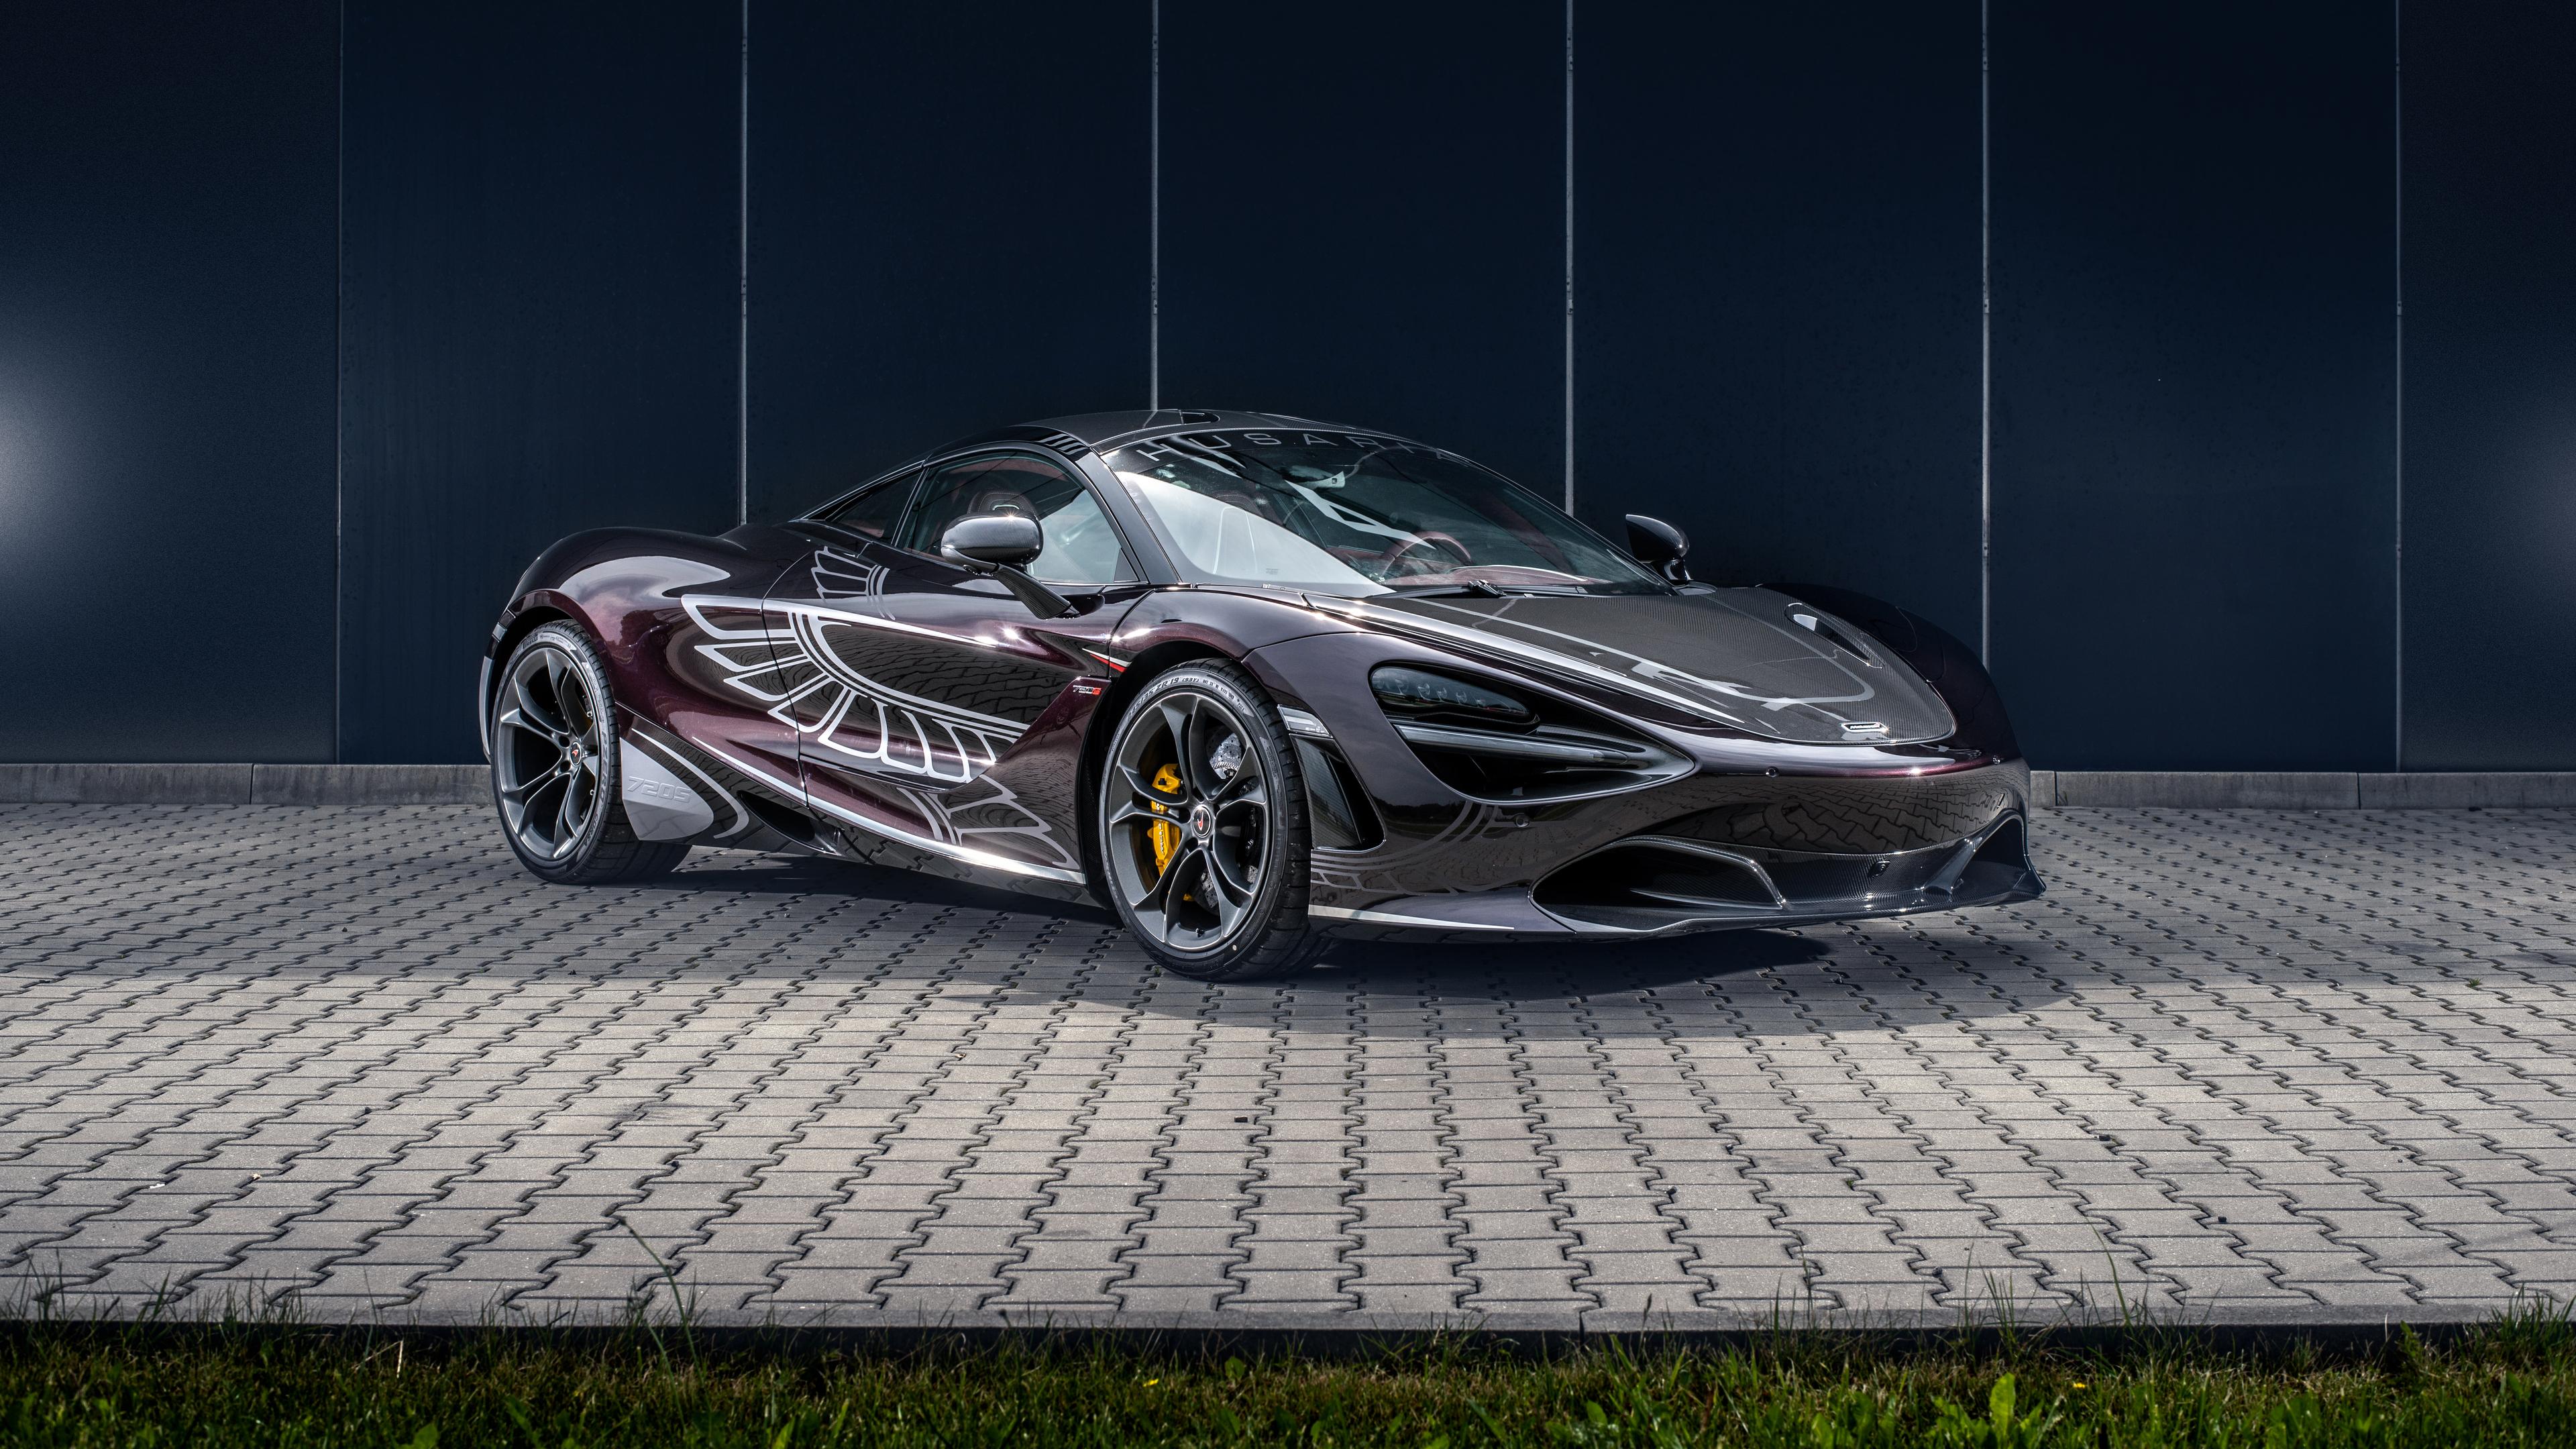 manhart carlex design mclaren 2019 1572660895 - Manhart Carlex Design McLaren 2019 - mclaren wallpapers, hd-wallpapers, cars wallpapers, 8k wallpapers, 5k wallpapers, 4k-wallpapers